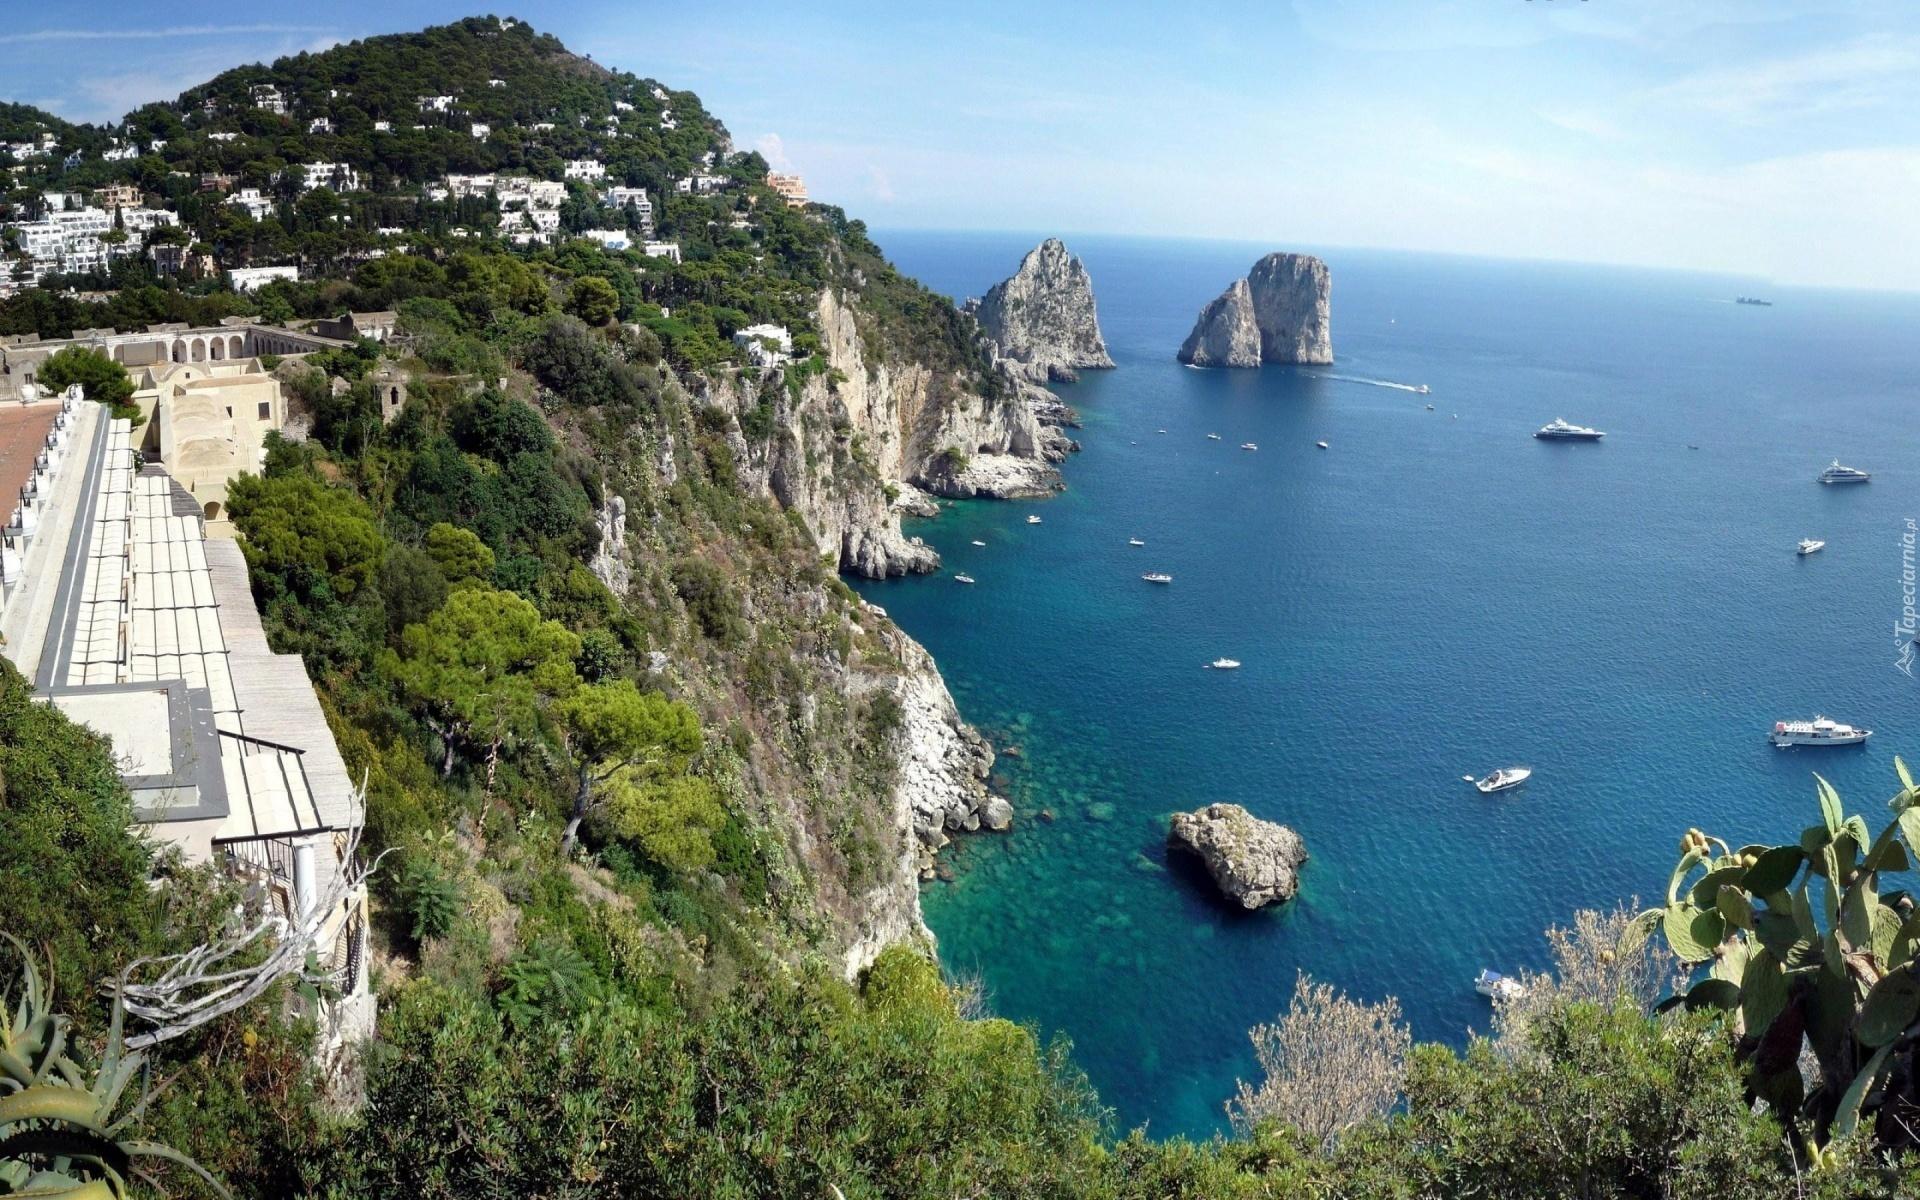 Albania Wallpaper Hd Morze Wyspa Capri